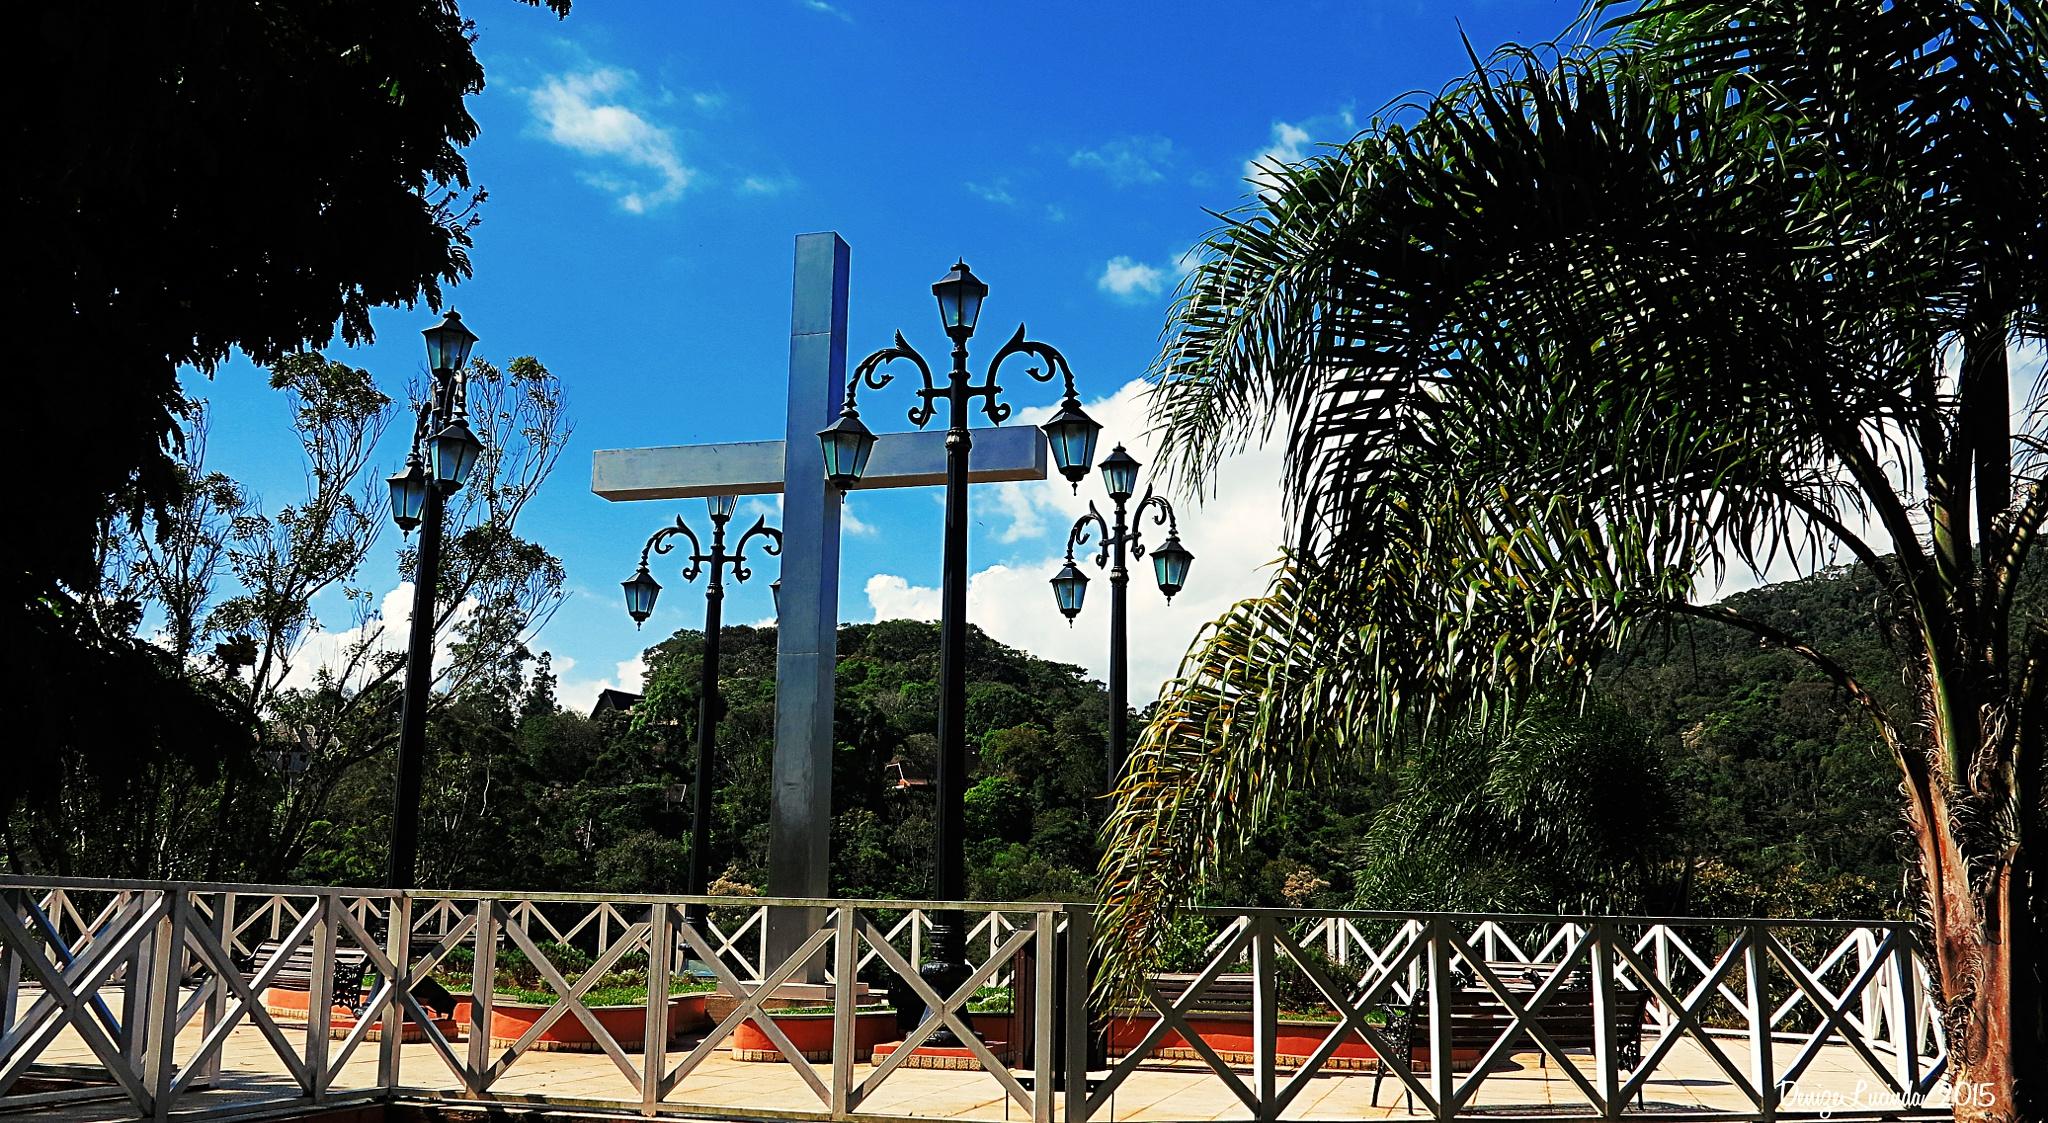 Mirante - Santo Antônio do Pinhal - SP by denizelucinda